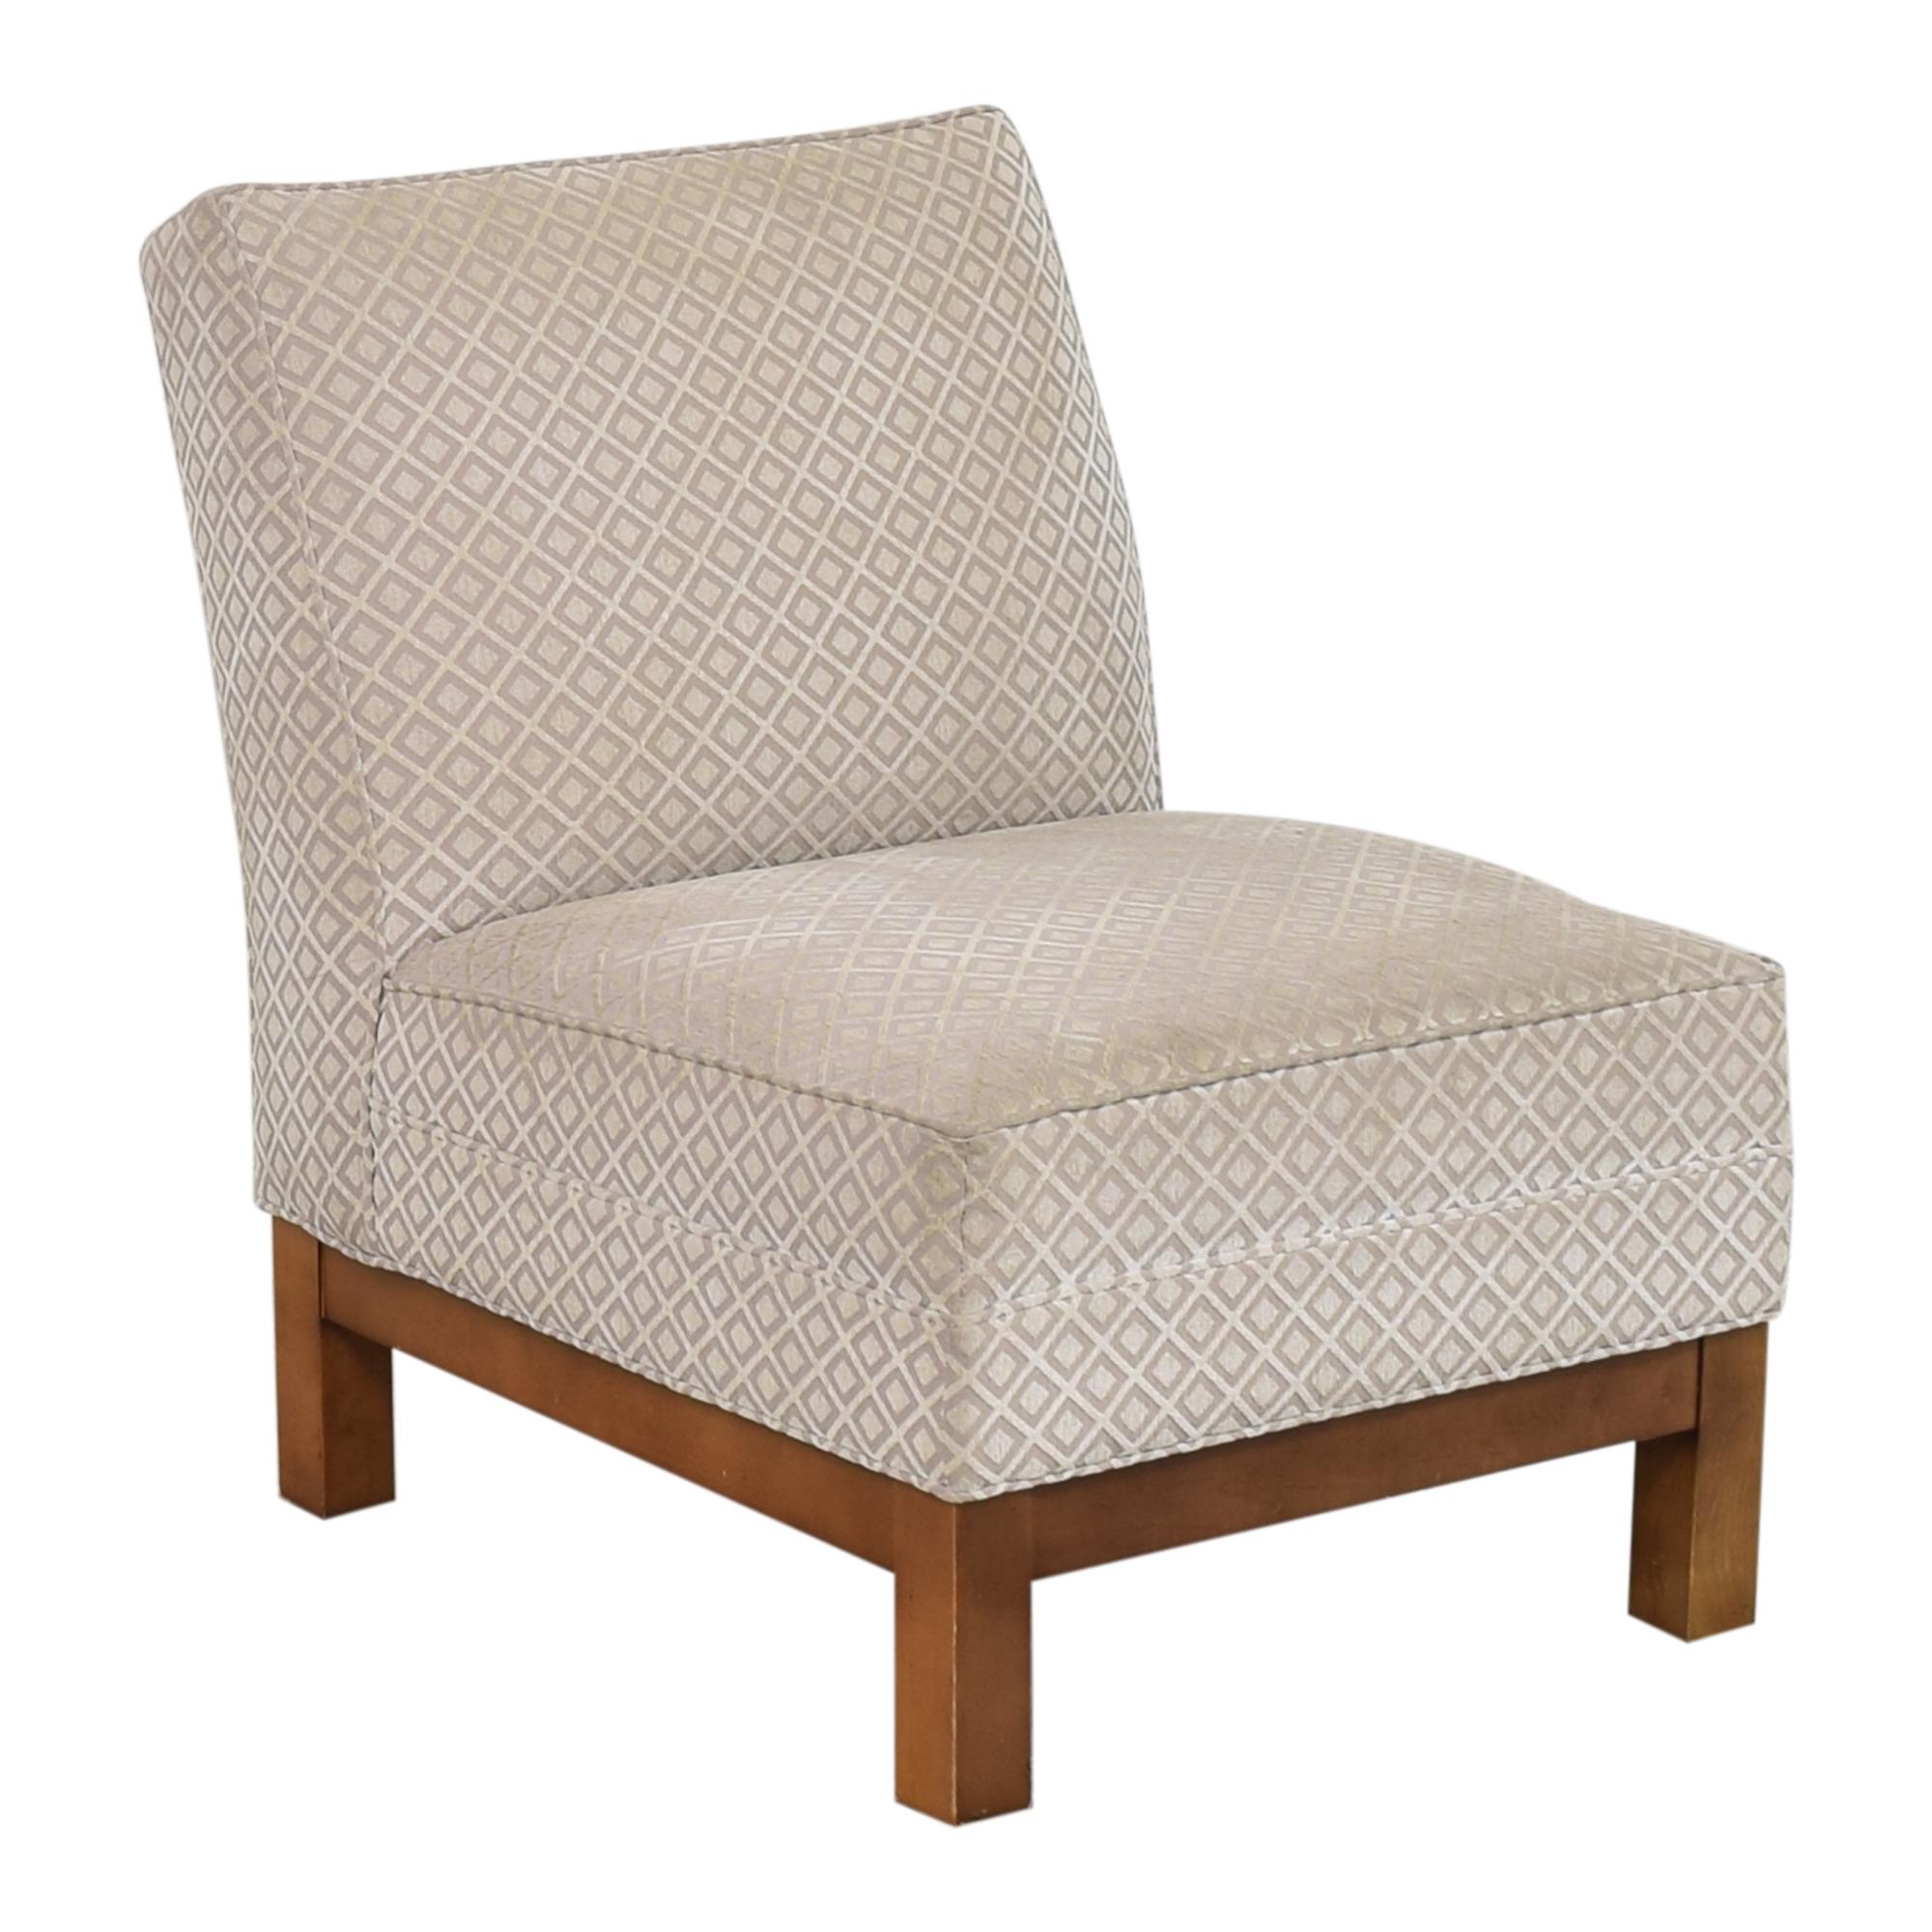 Mitchell Gold + Bob Williams Mitchell Gold + Bob Williams Slipper Chair for sale